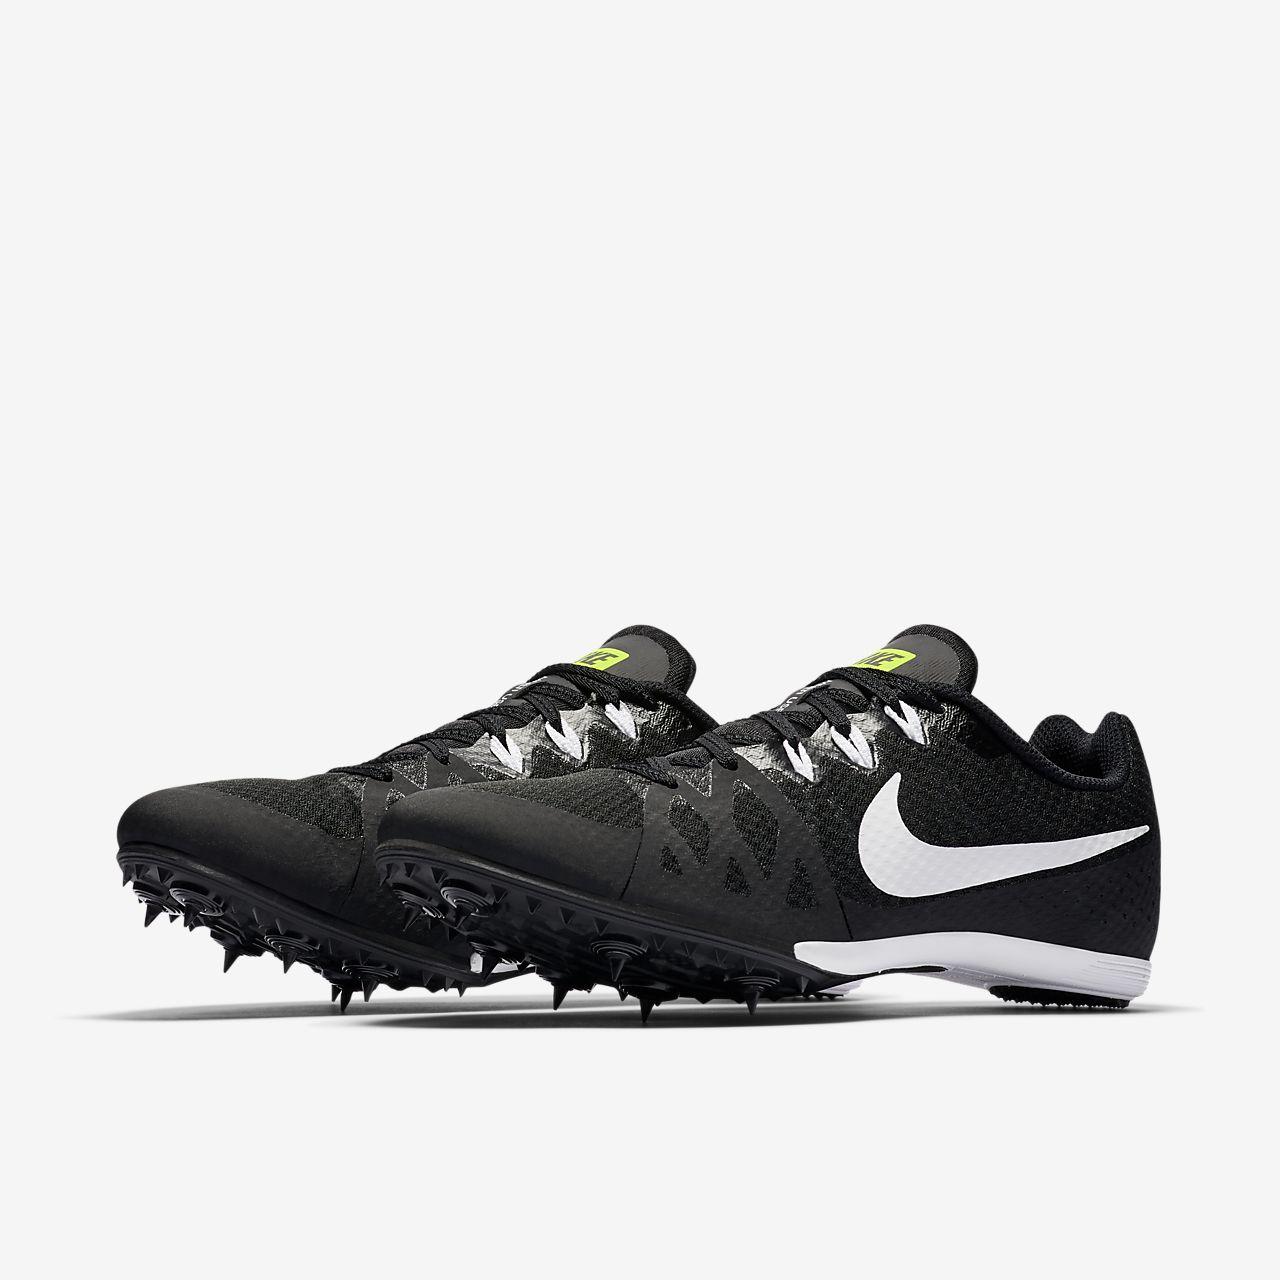 premium selection bd9e9 2ffb2 Nike Zoom Rival M 8